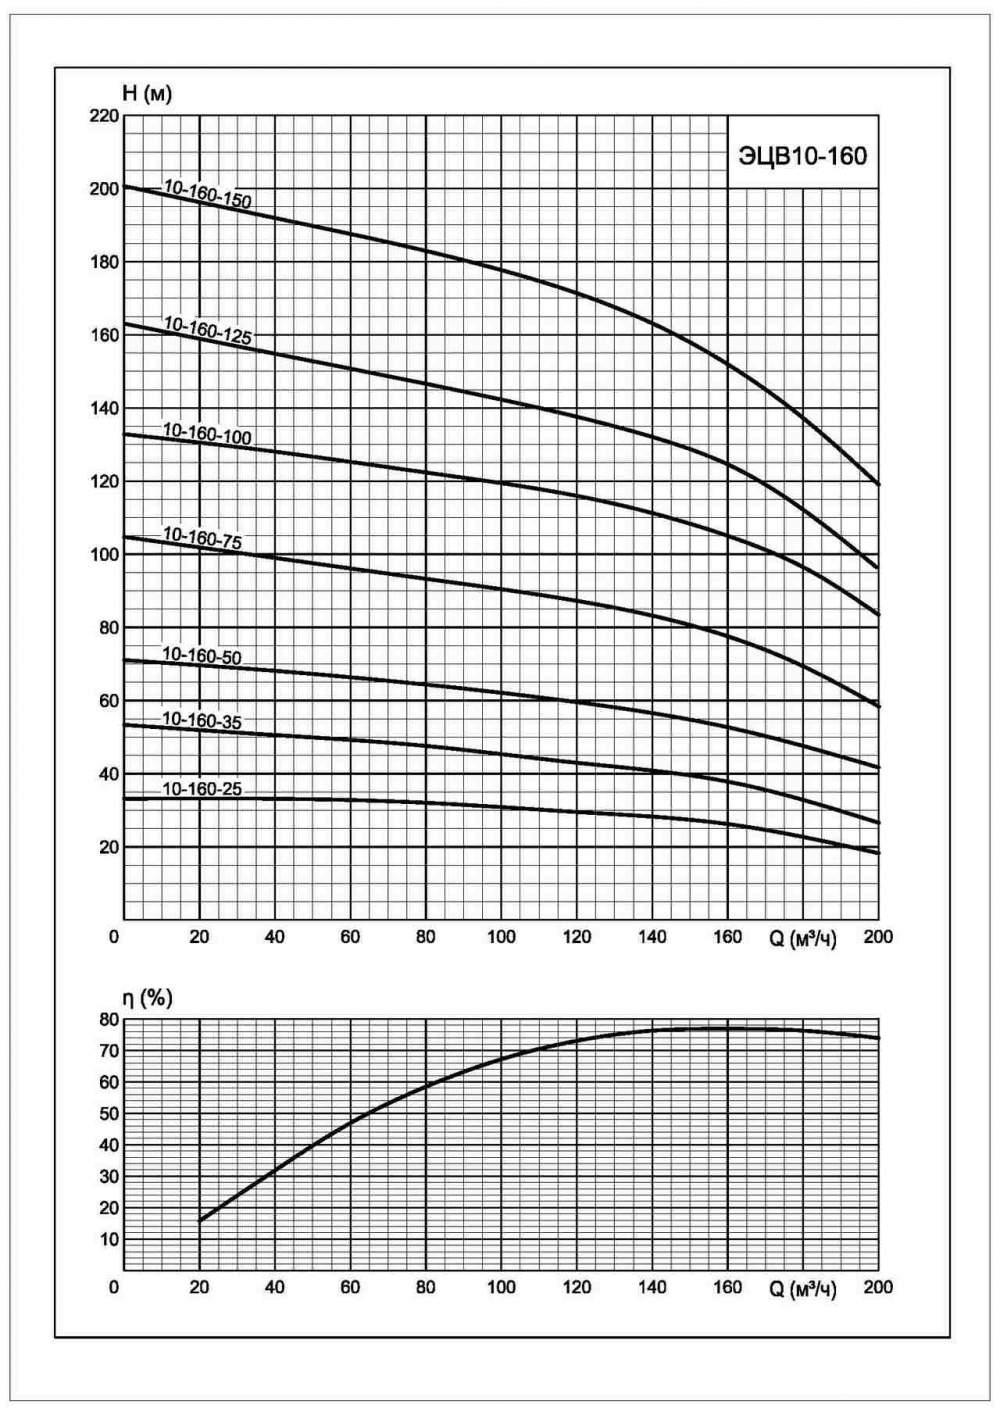 Напорная характеристика насоса ЭЦВ 10-160-25*нро